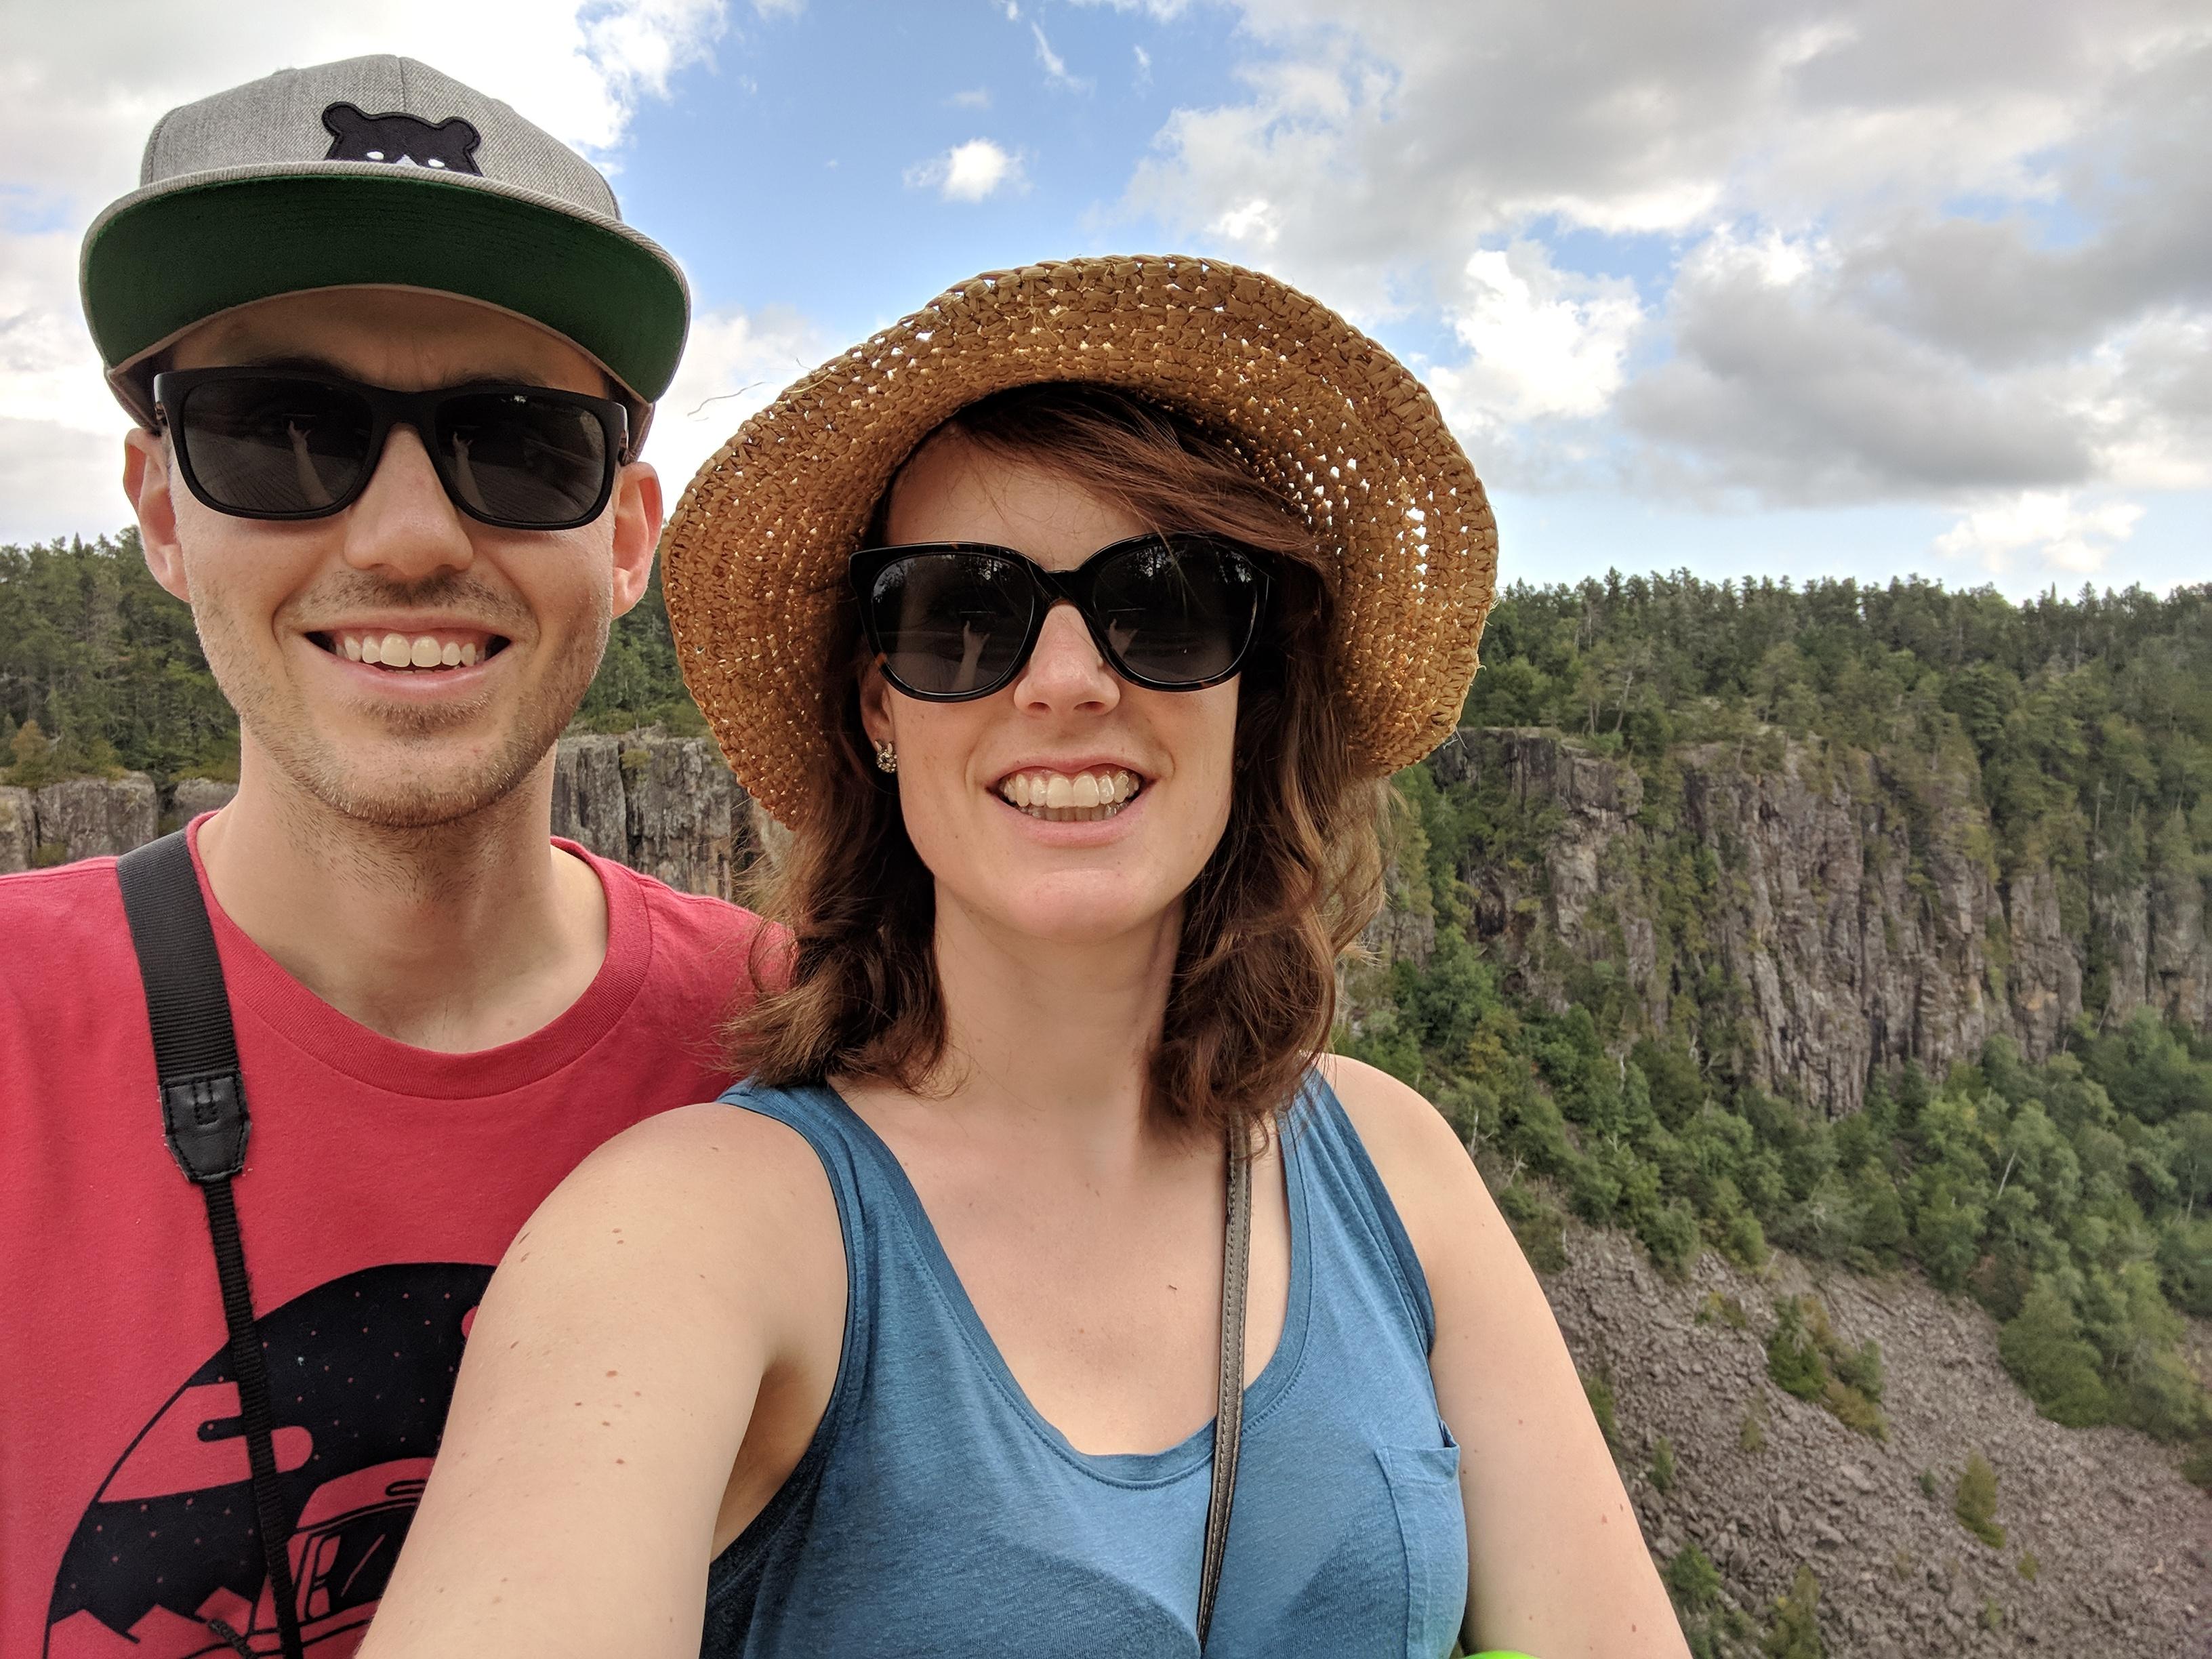 Selfie at Ouimet Canyon